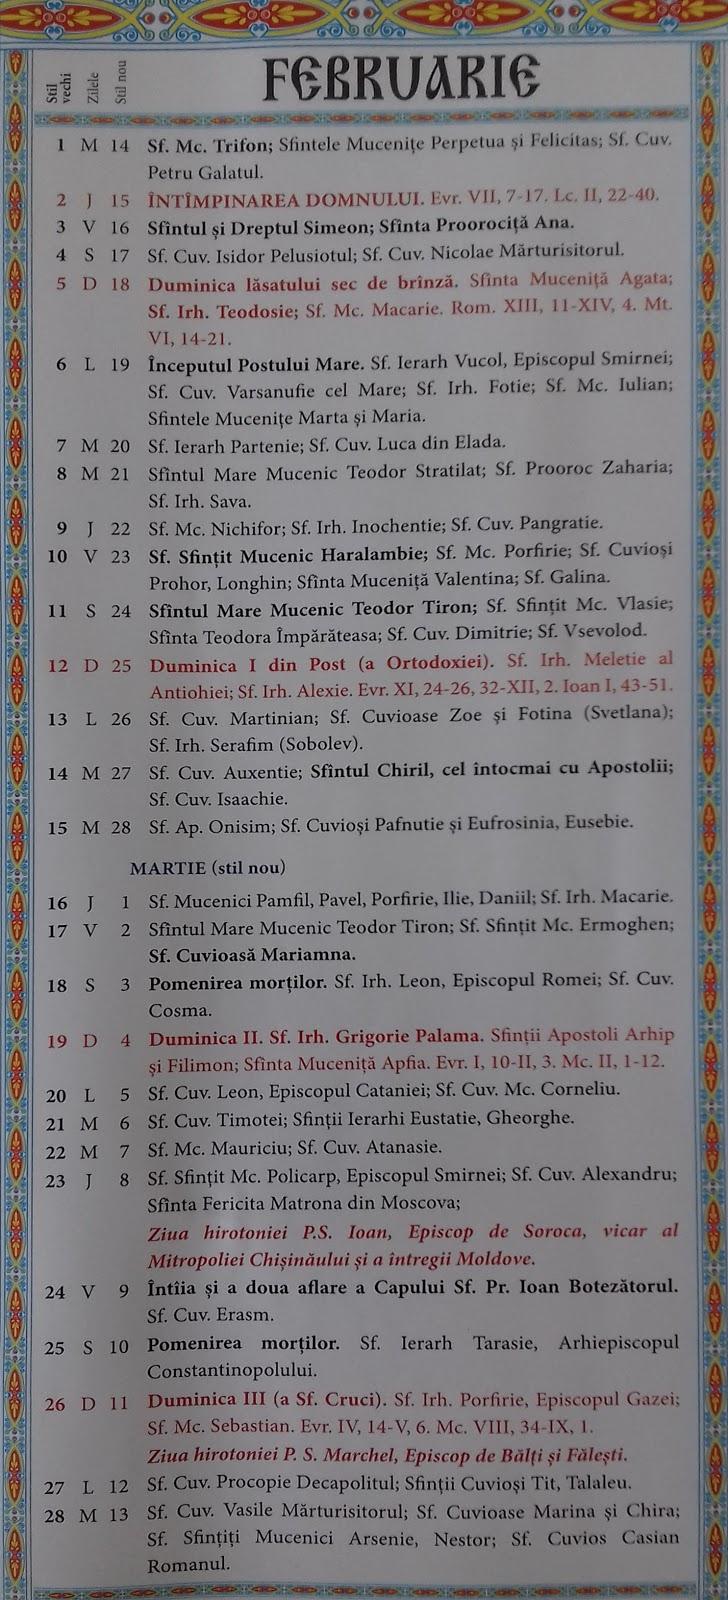 Calendar Crestin Ortodox Stil Vechi 2021 with regard to Calendar Ortodox Mai 2021